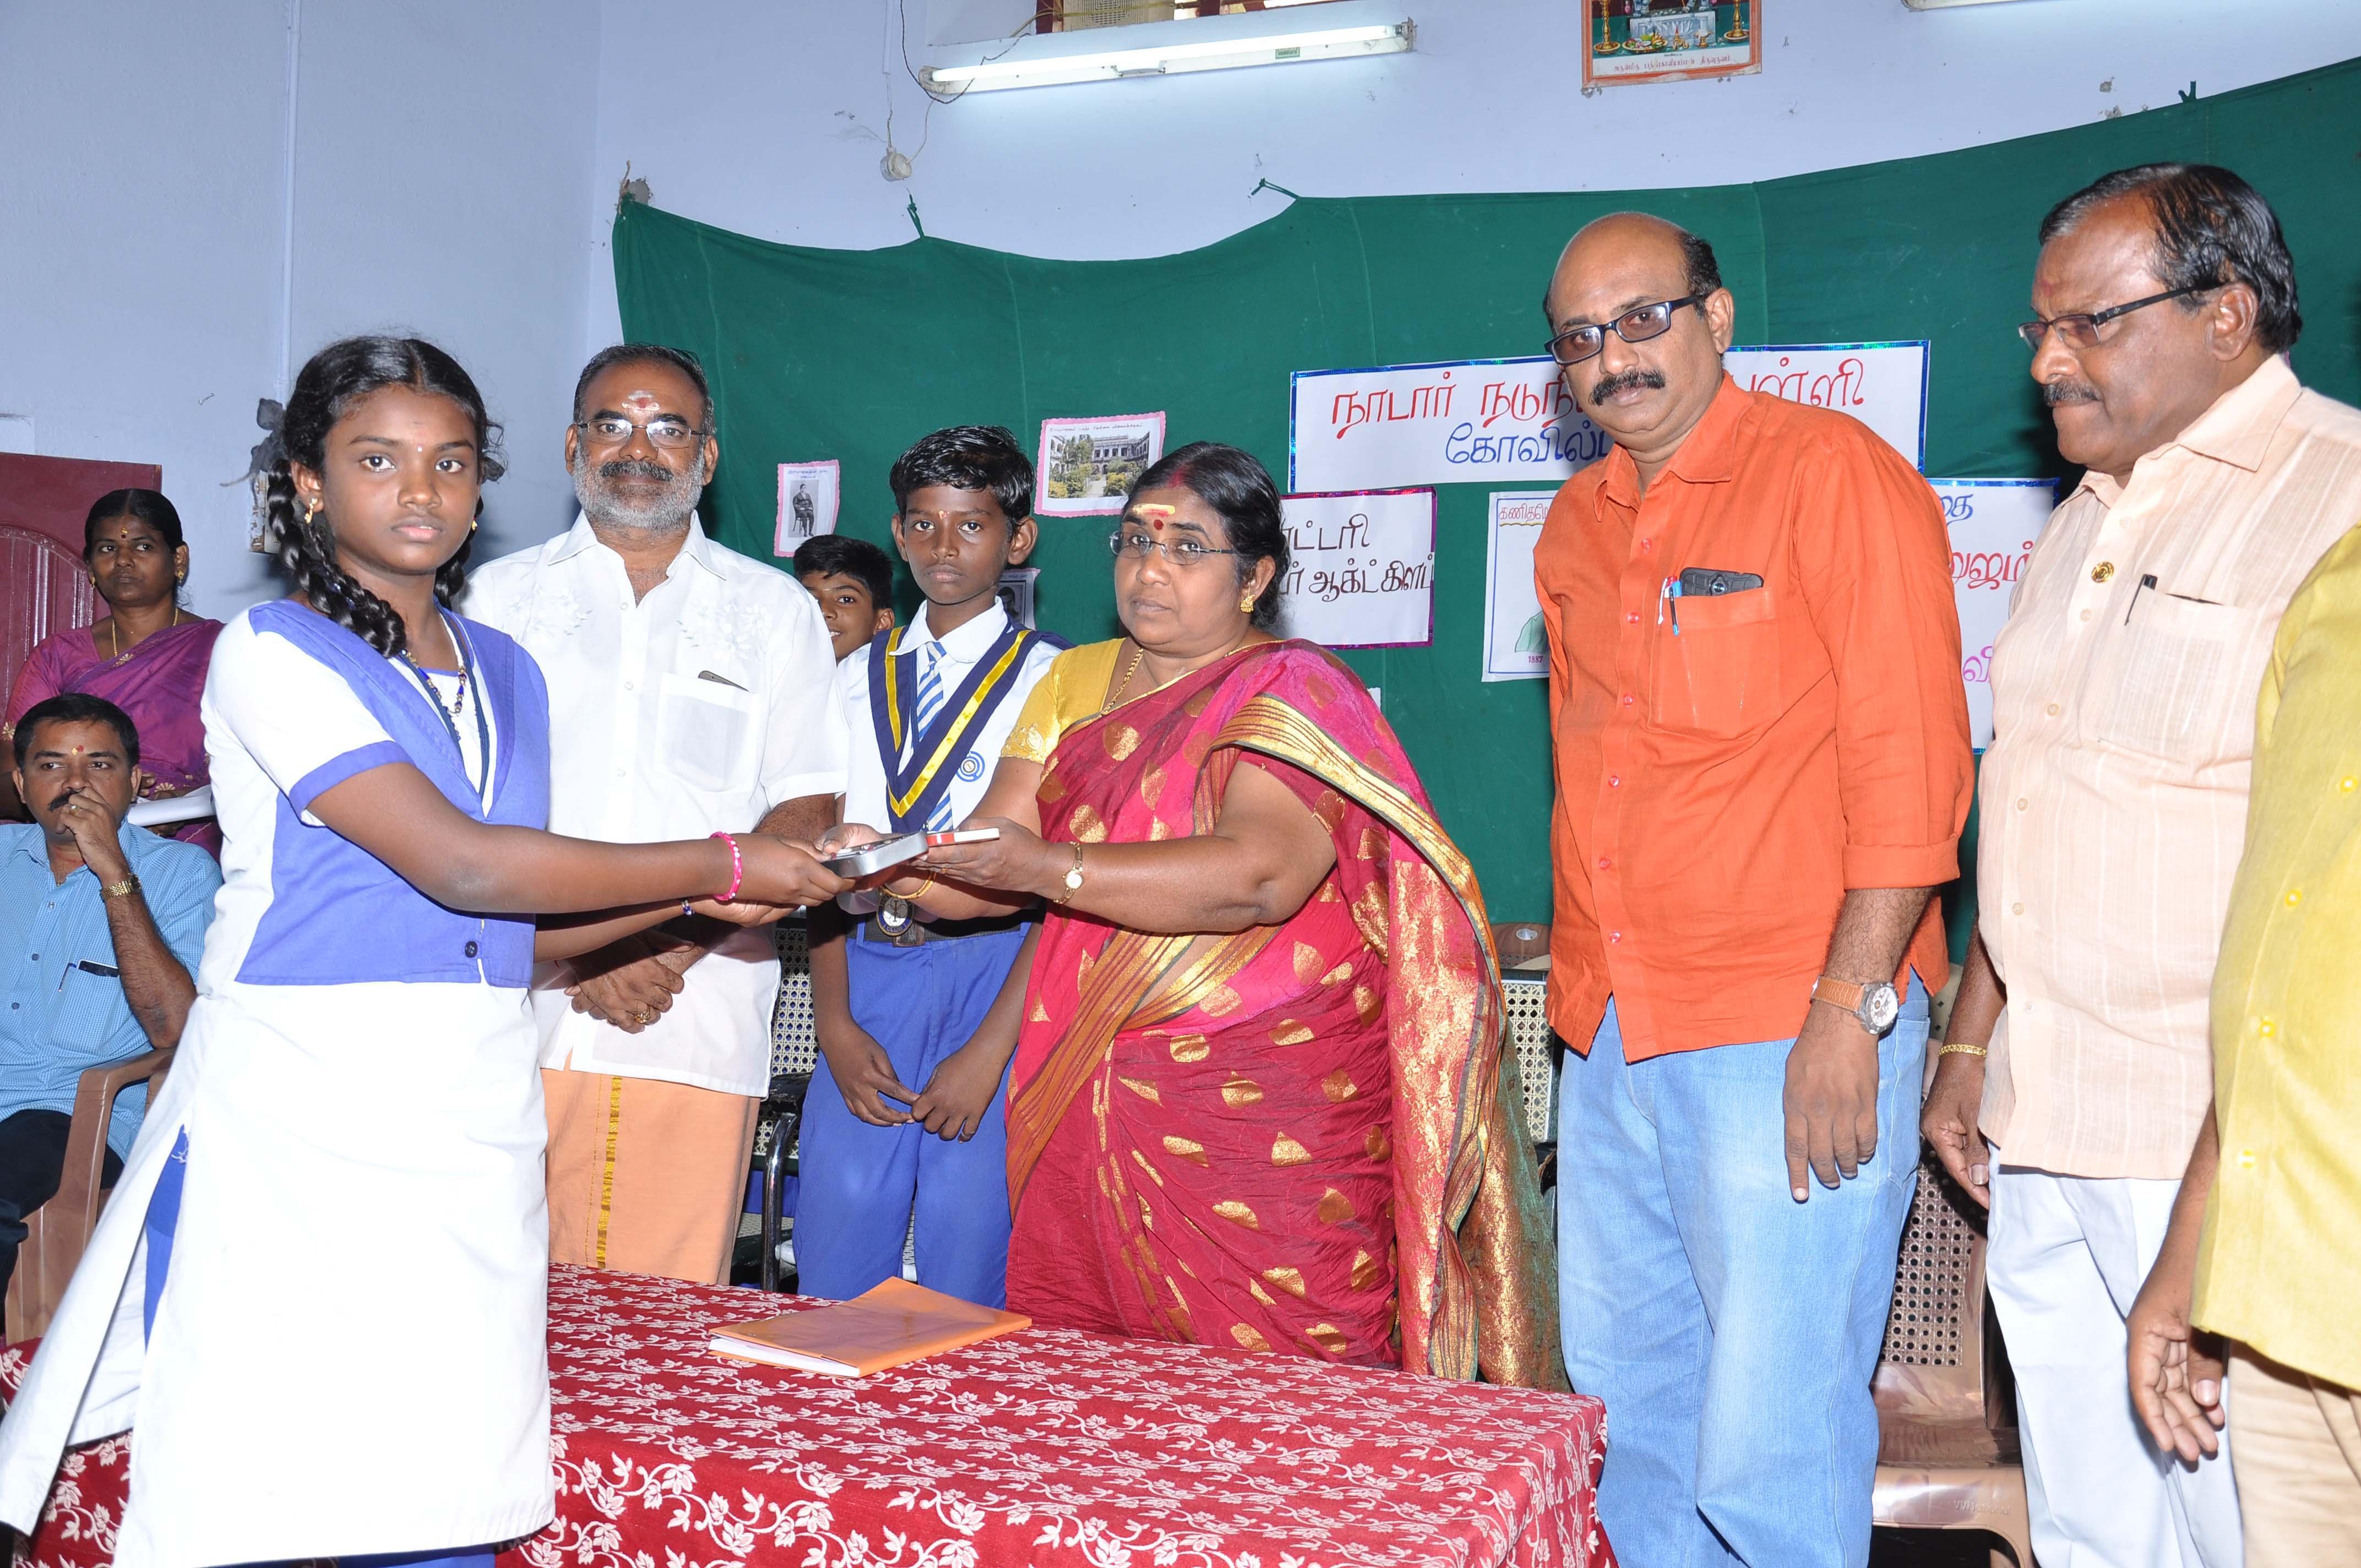 National mathematics day conducted in kovilpatti nadar school